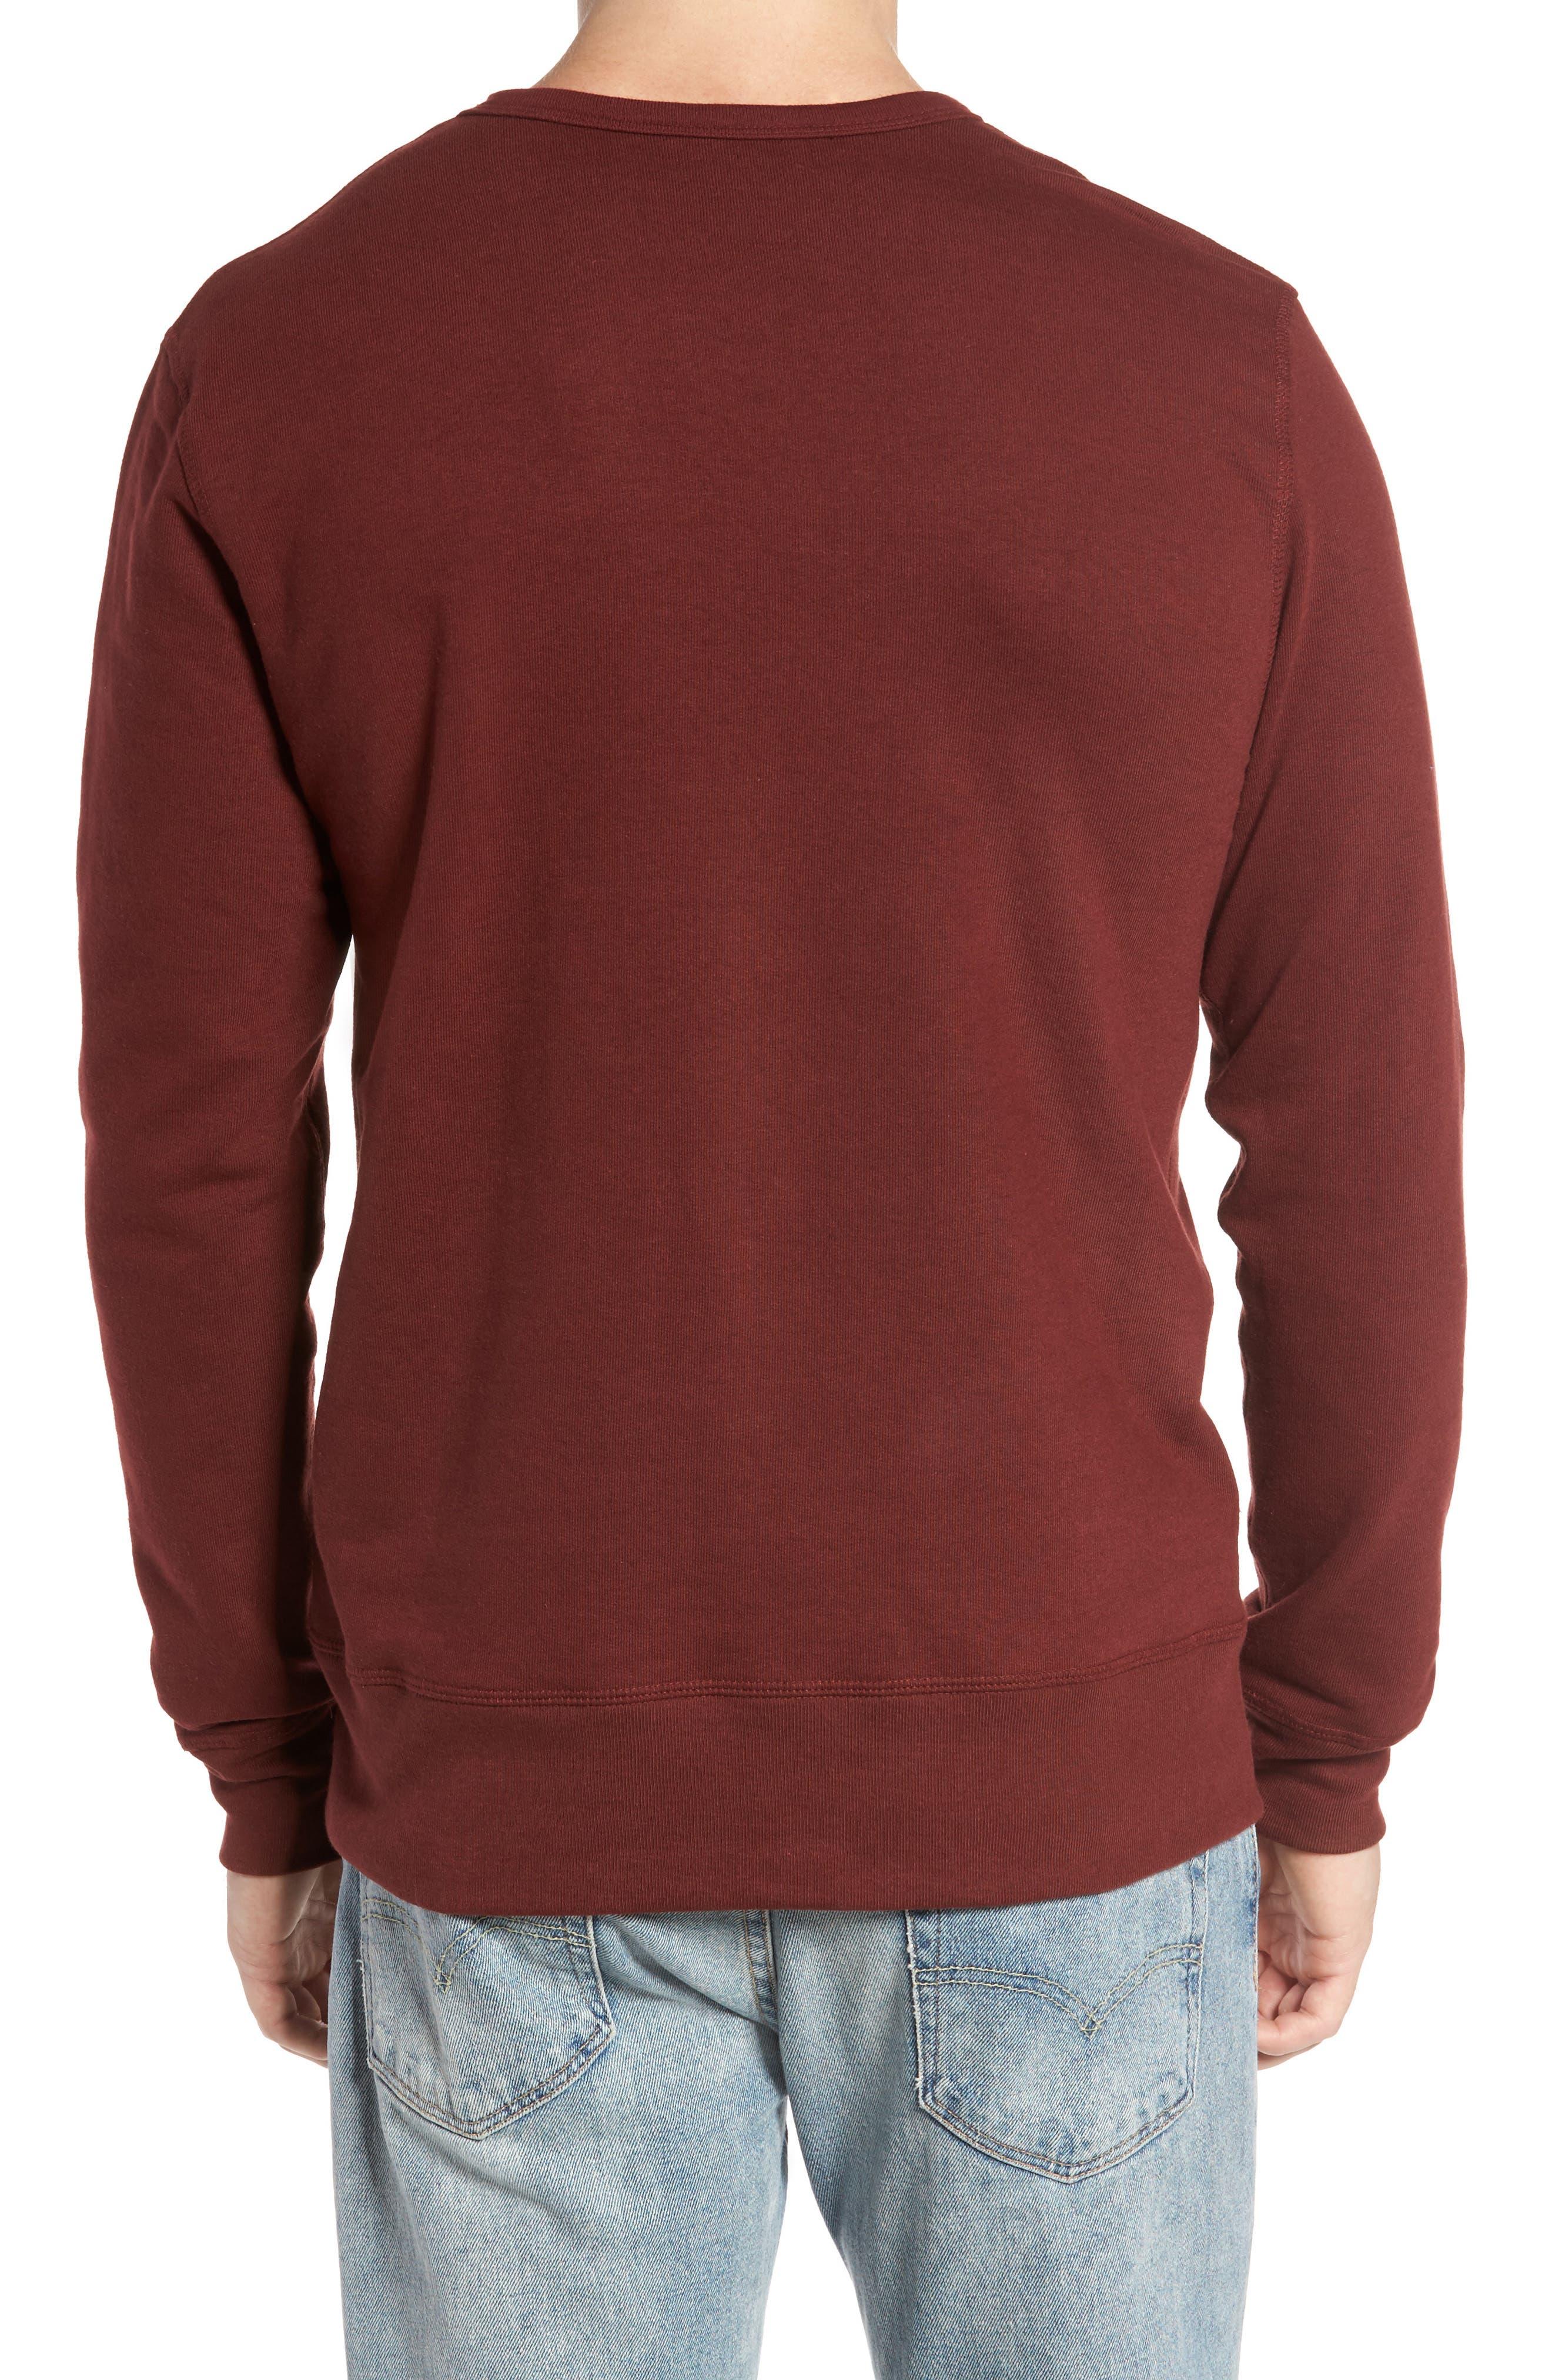 B-Side Reversible Crewneck Sweatshirt,                             Alternate thumbnail 2, color,                             Maroon